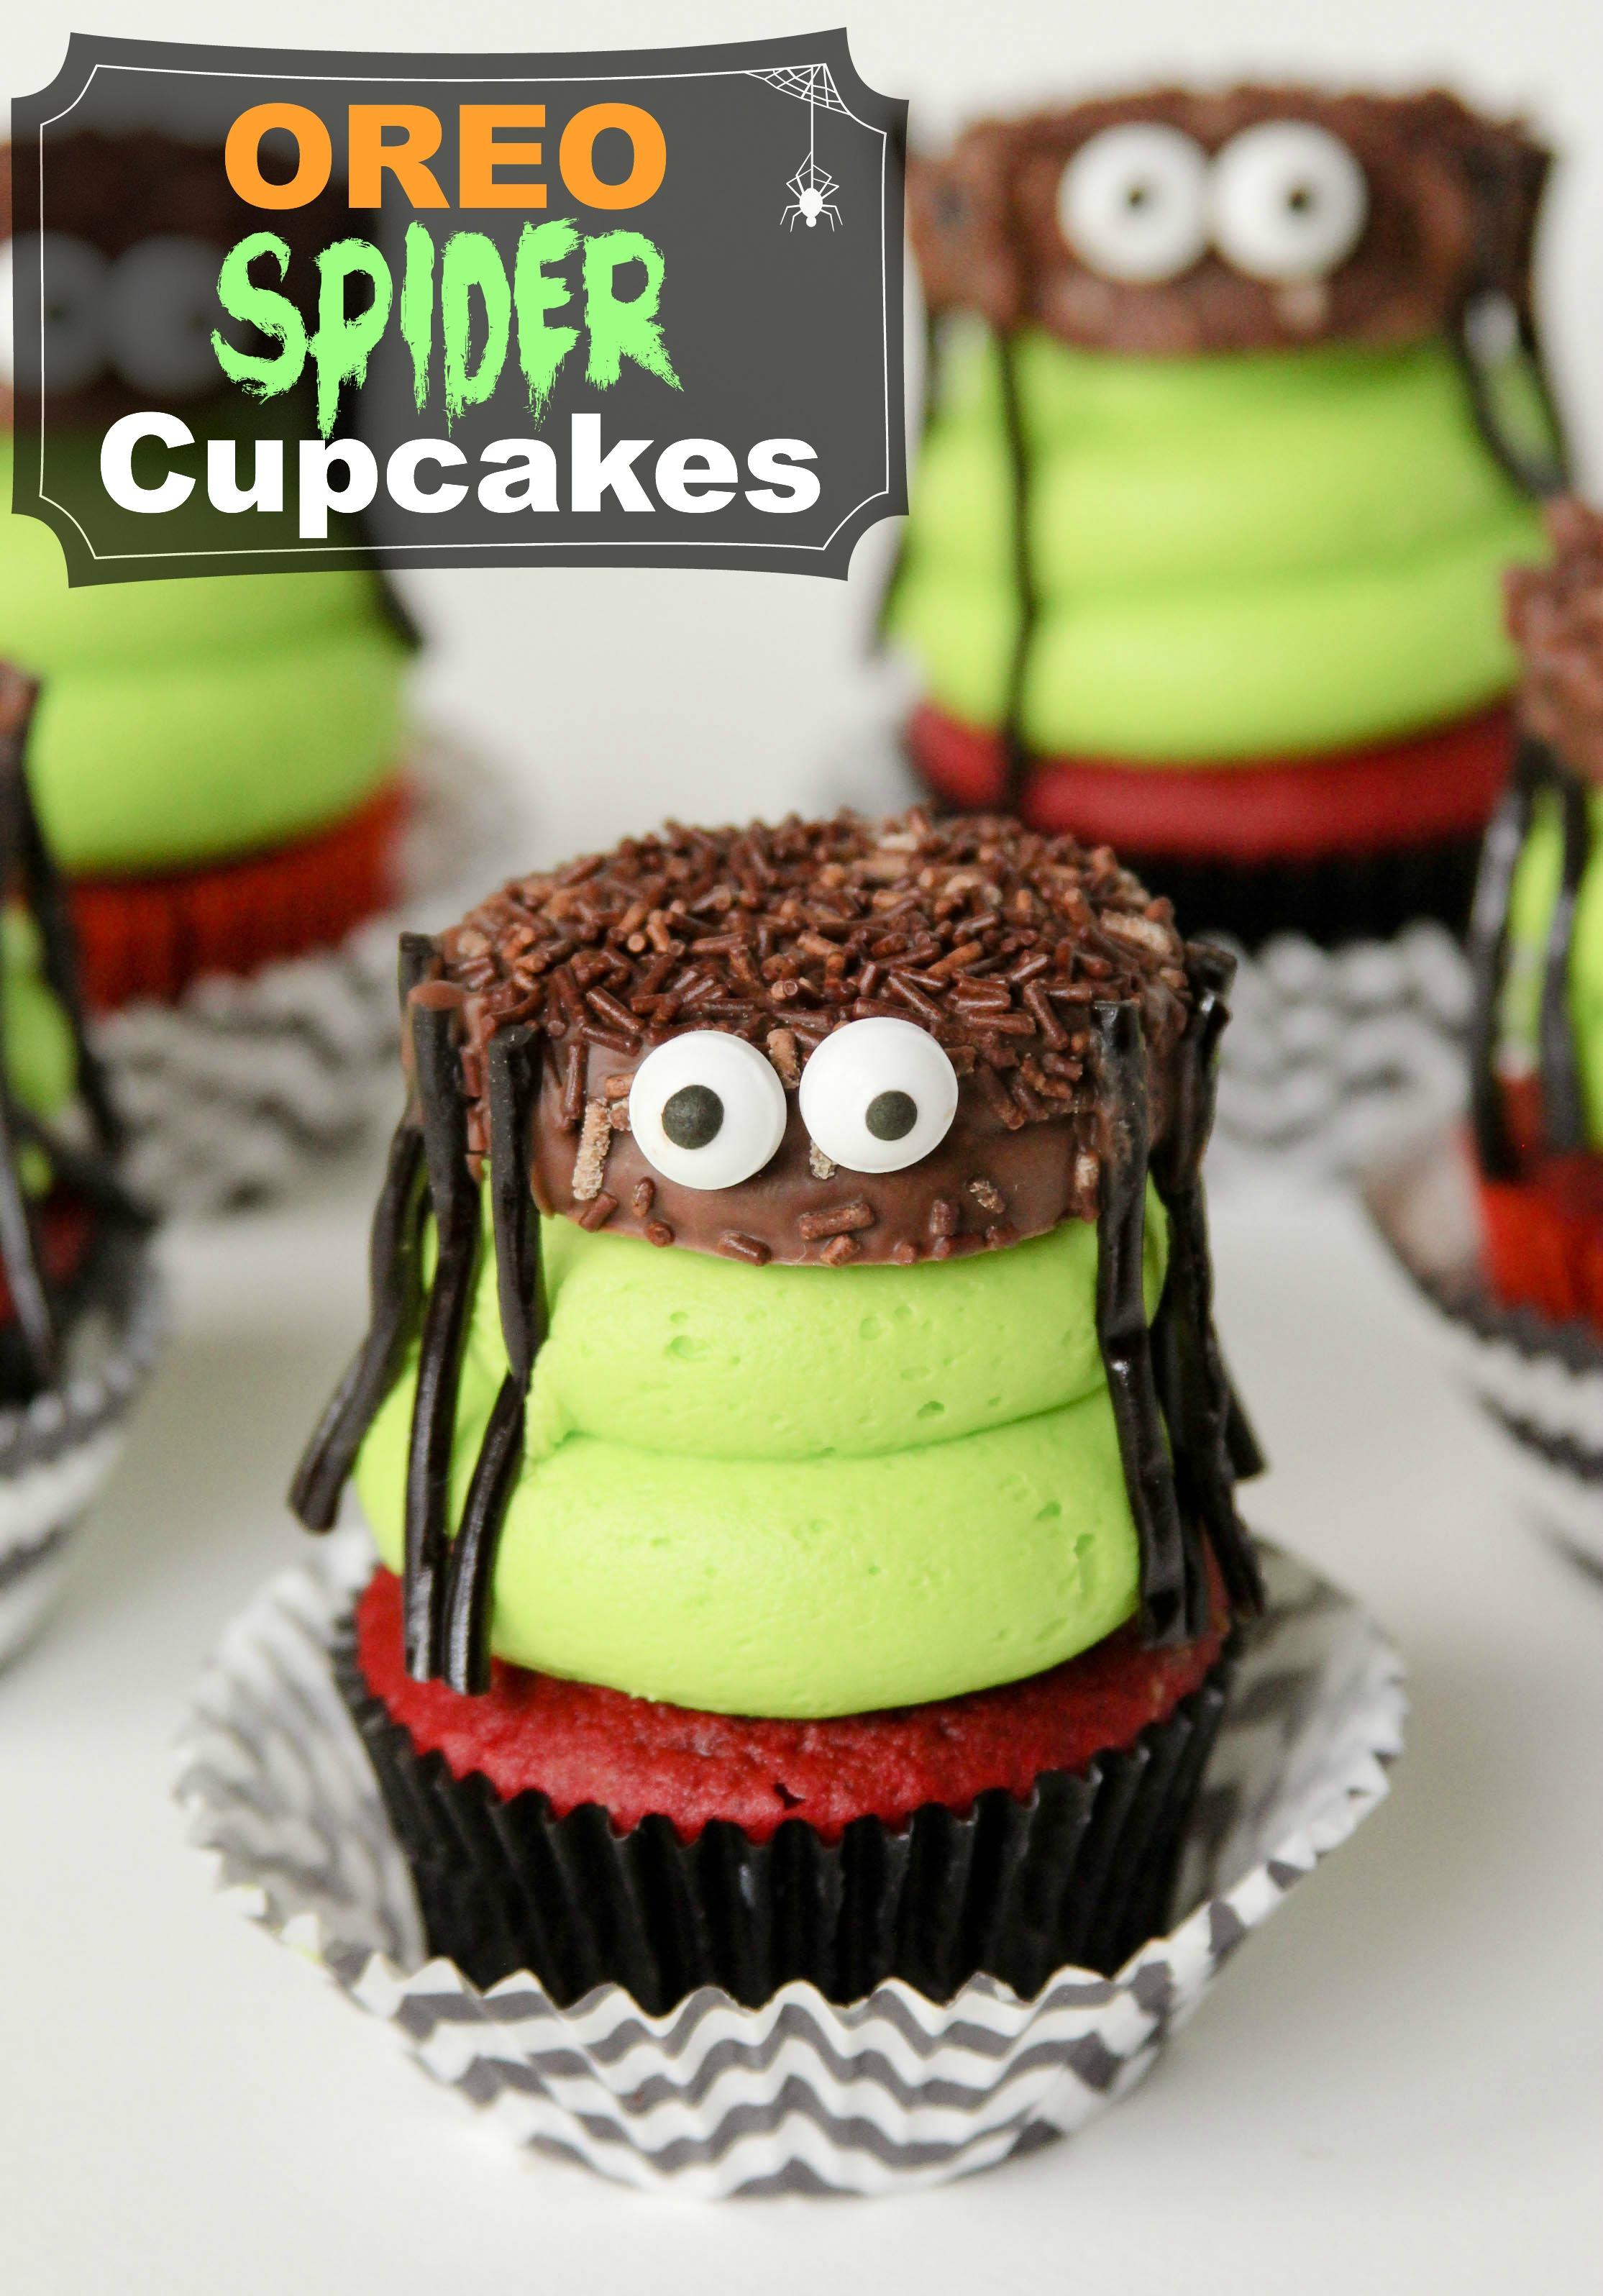 6 Photos of Halloween Spider Cupcakes With Oreos